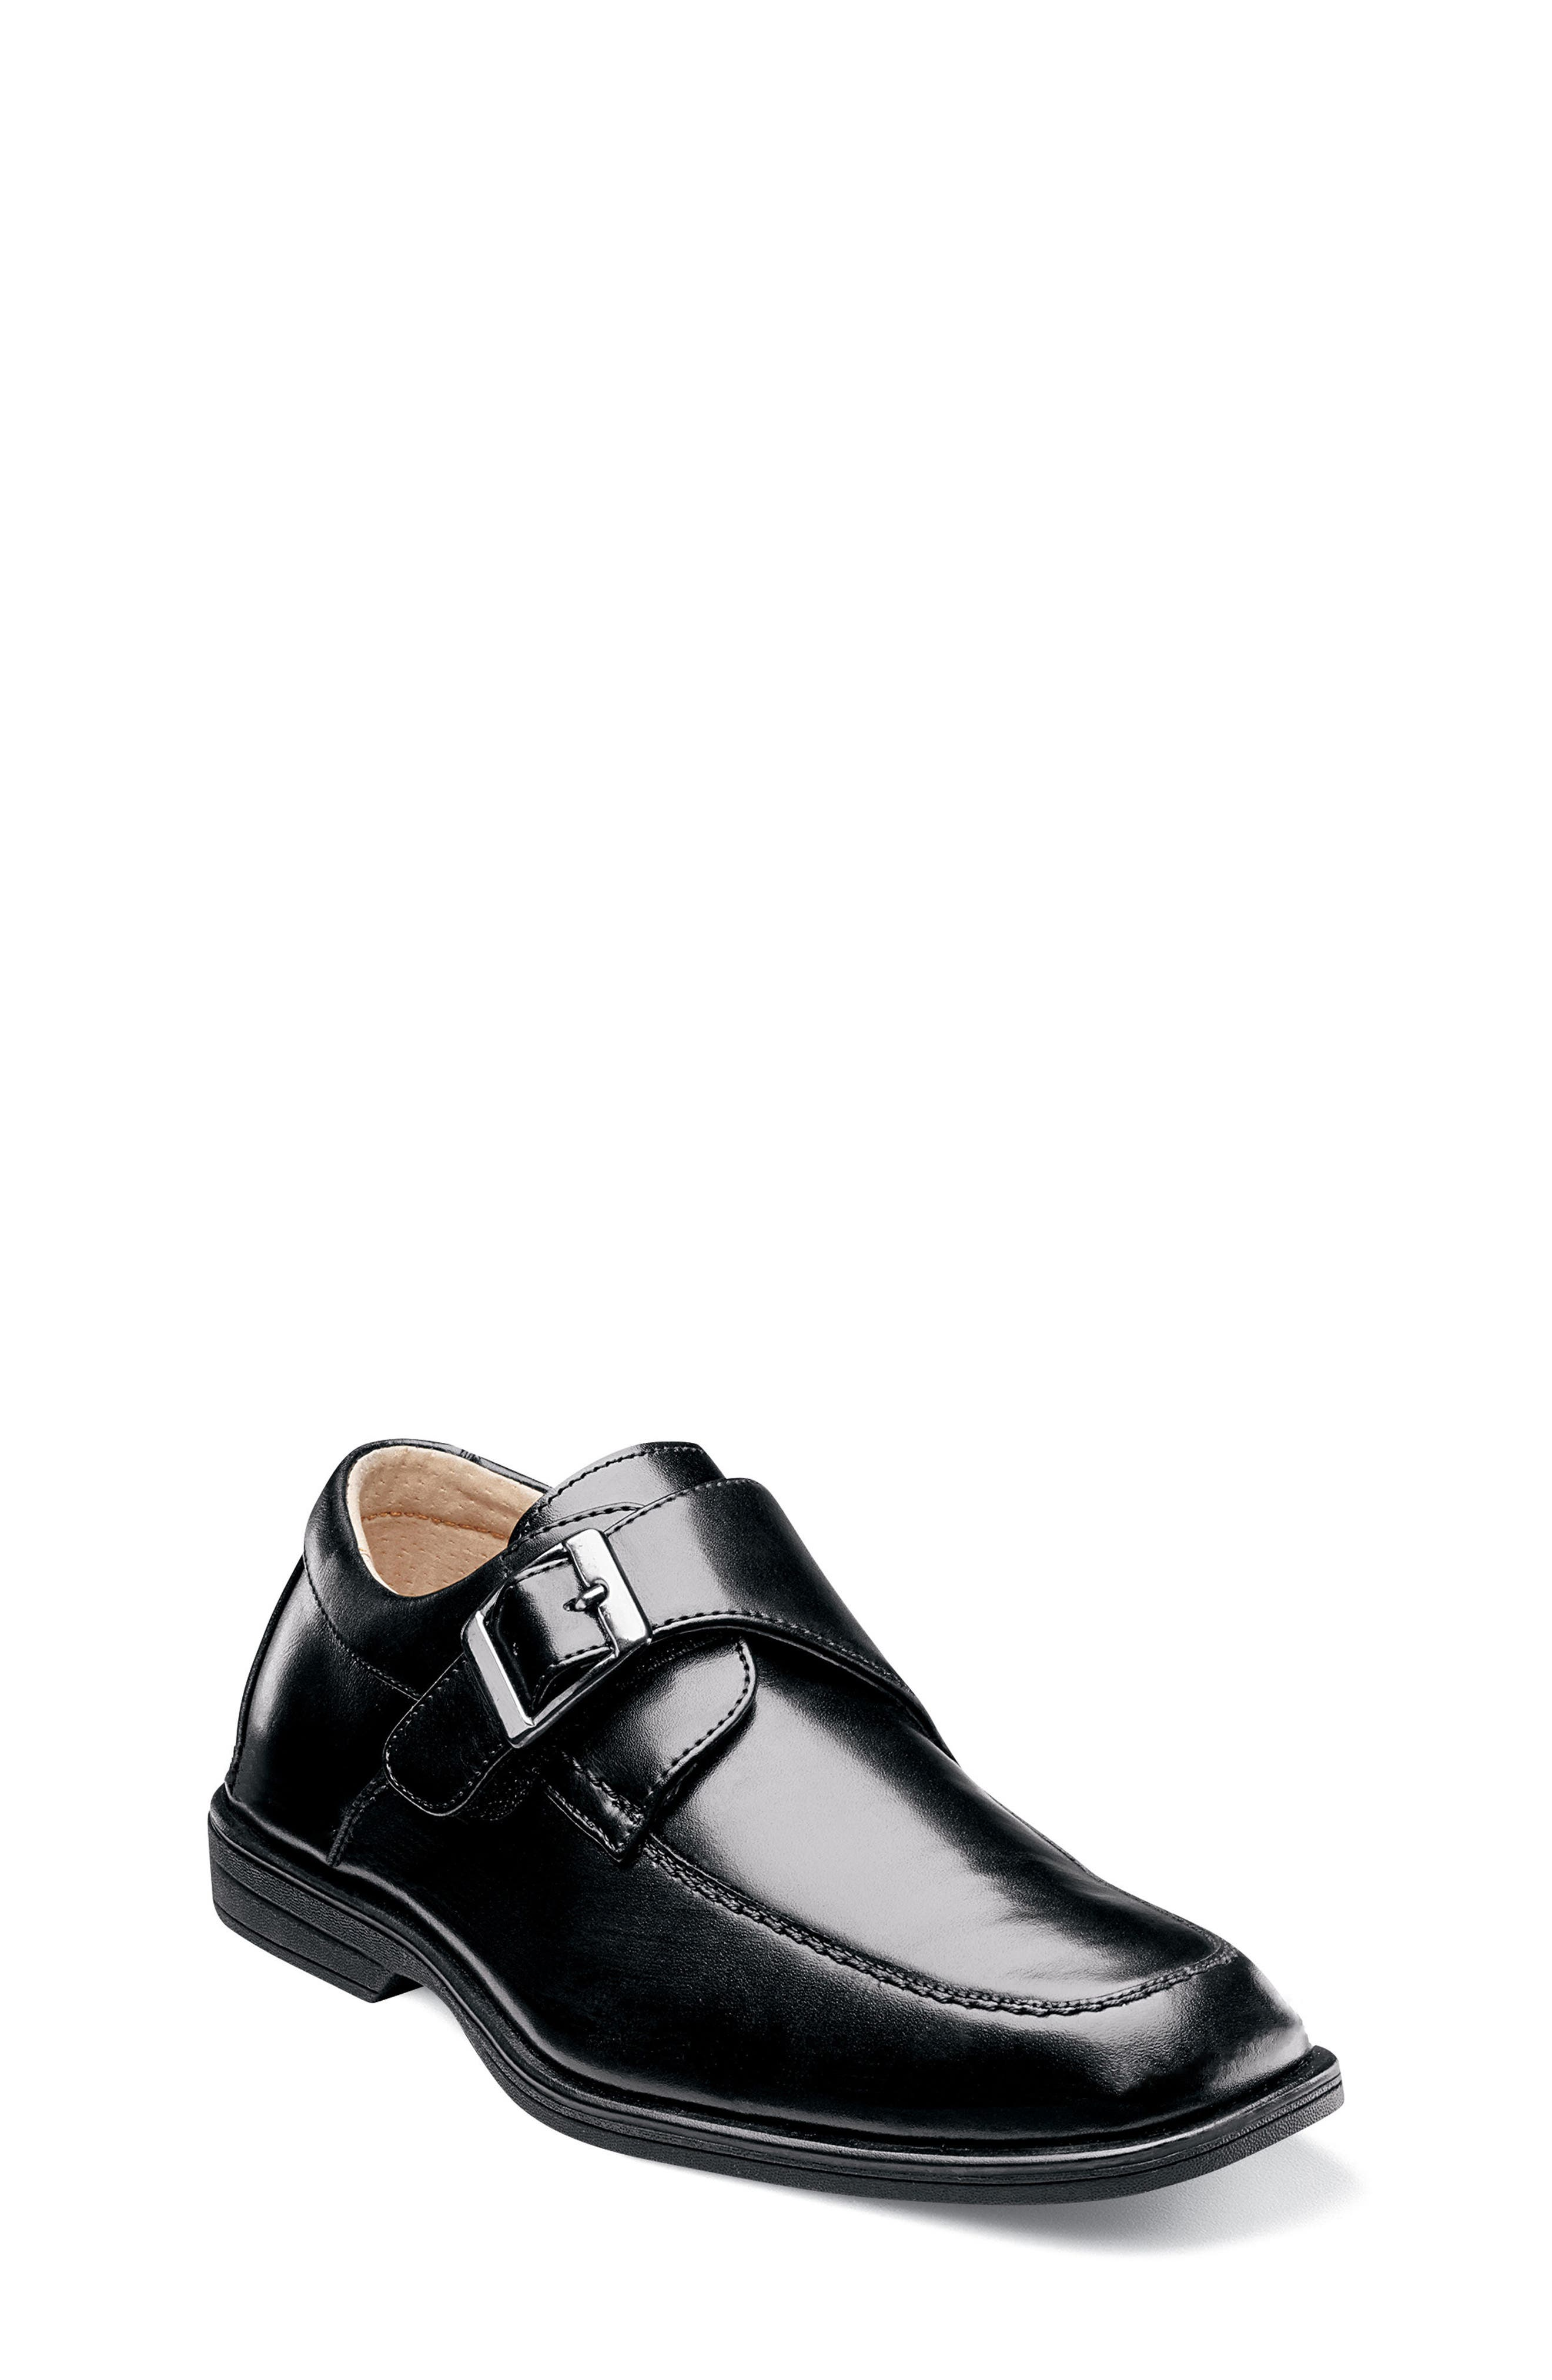 FLORSHEIM 'Reveal' Monk Strap Slip-On, Main, color, BLACK